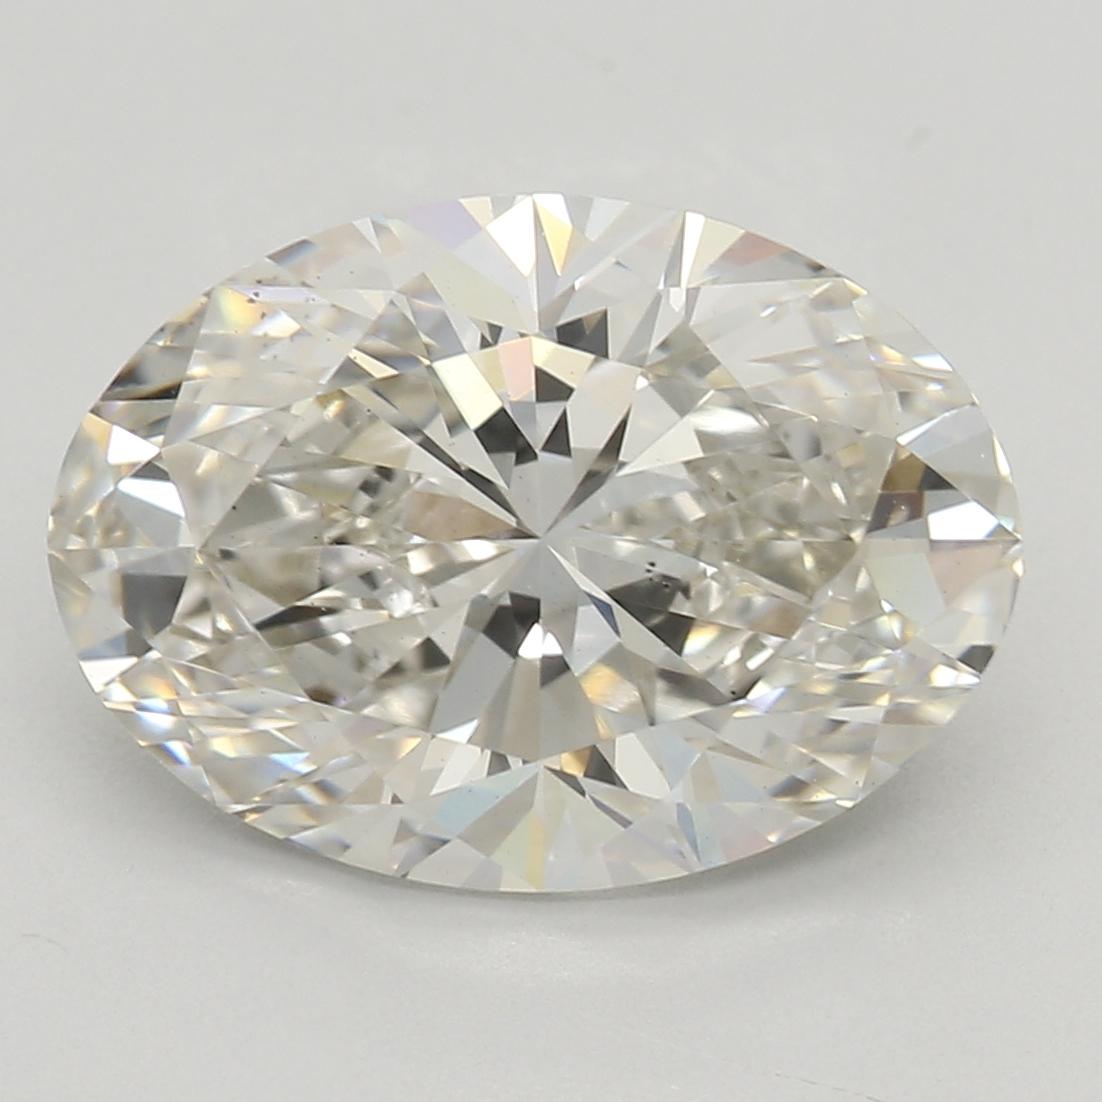 2.52 Carat I-VS2 Excellent Oval Diamond